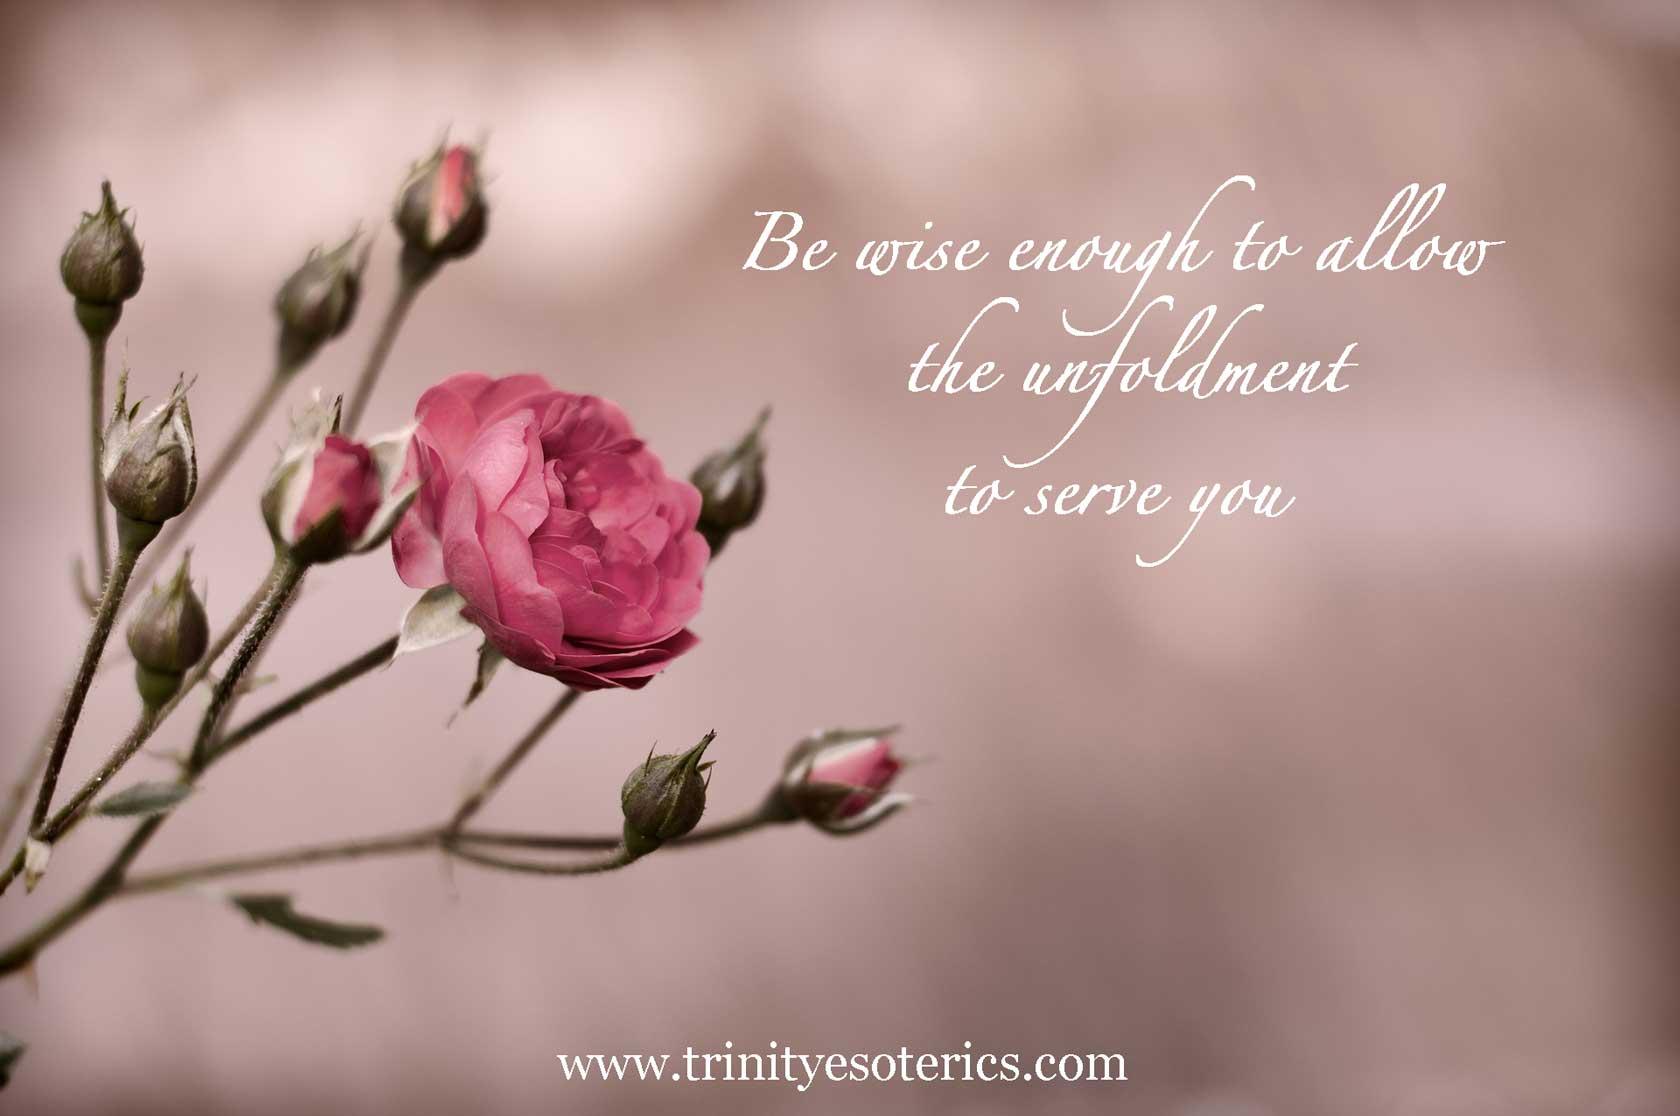 blooming rose trinity esoterics